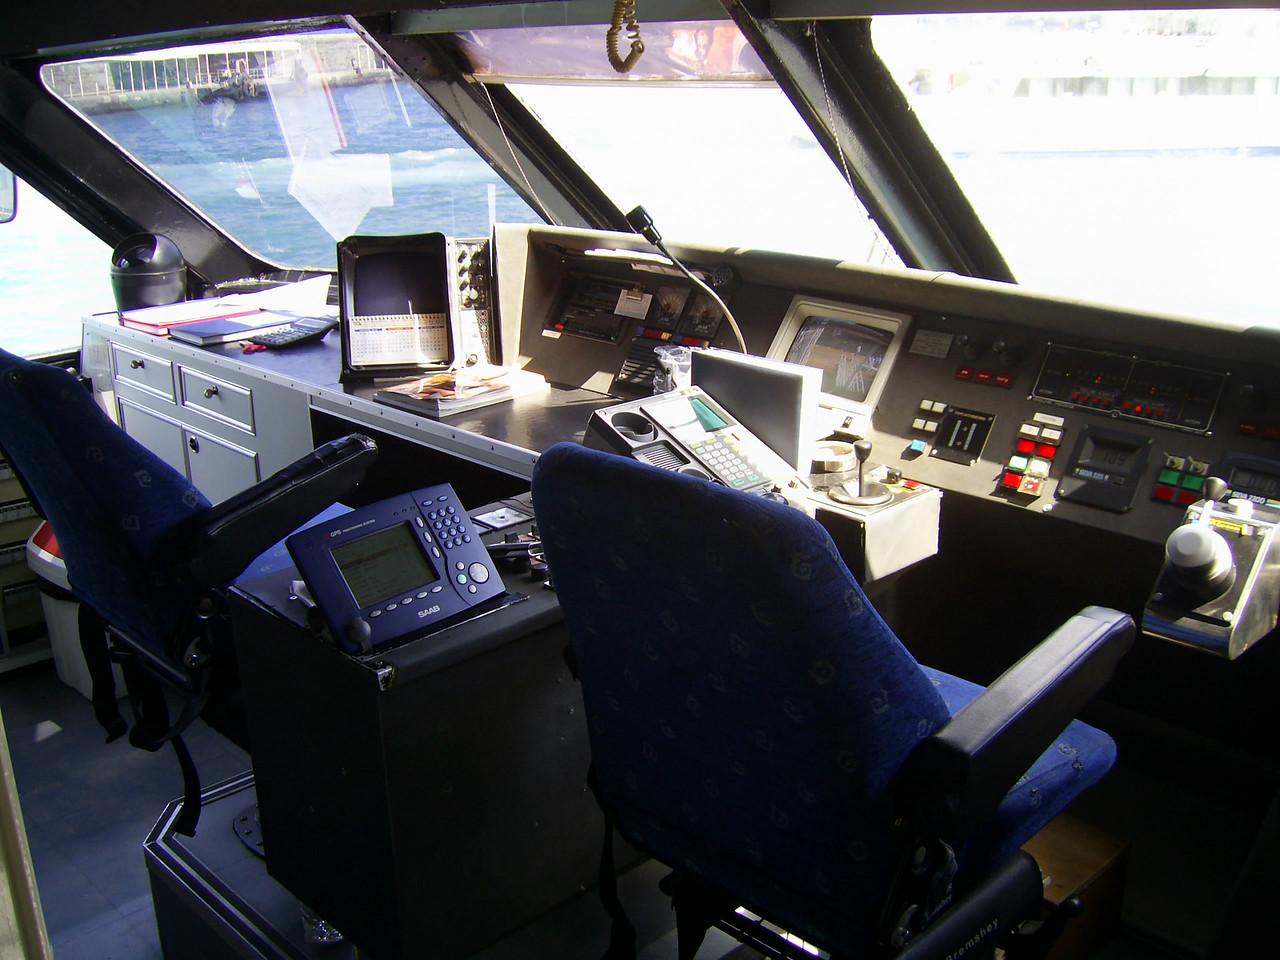 2010 - On board ISCHIA JET : the bridge.